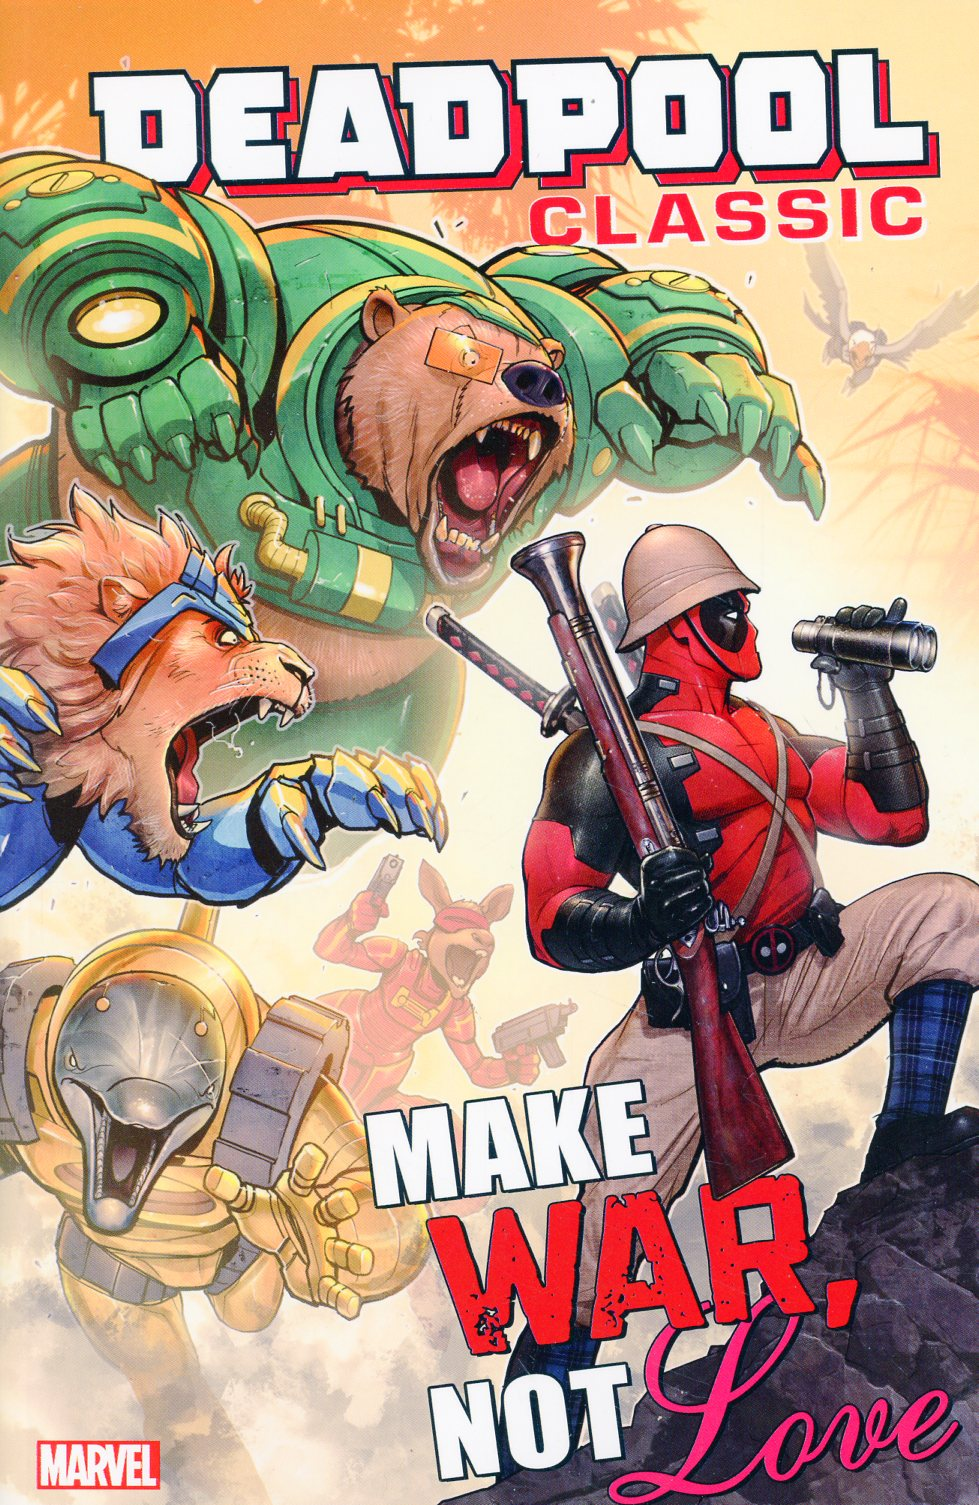 Deadpool Classic Vol 19 Make War Not Love TP